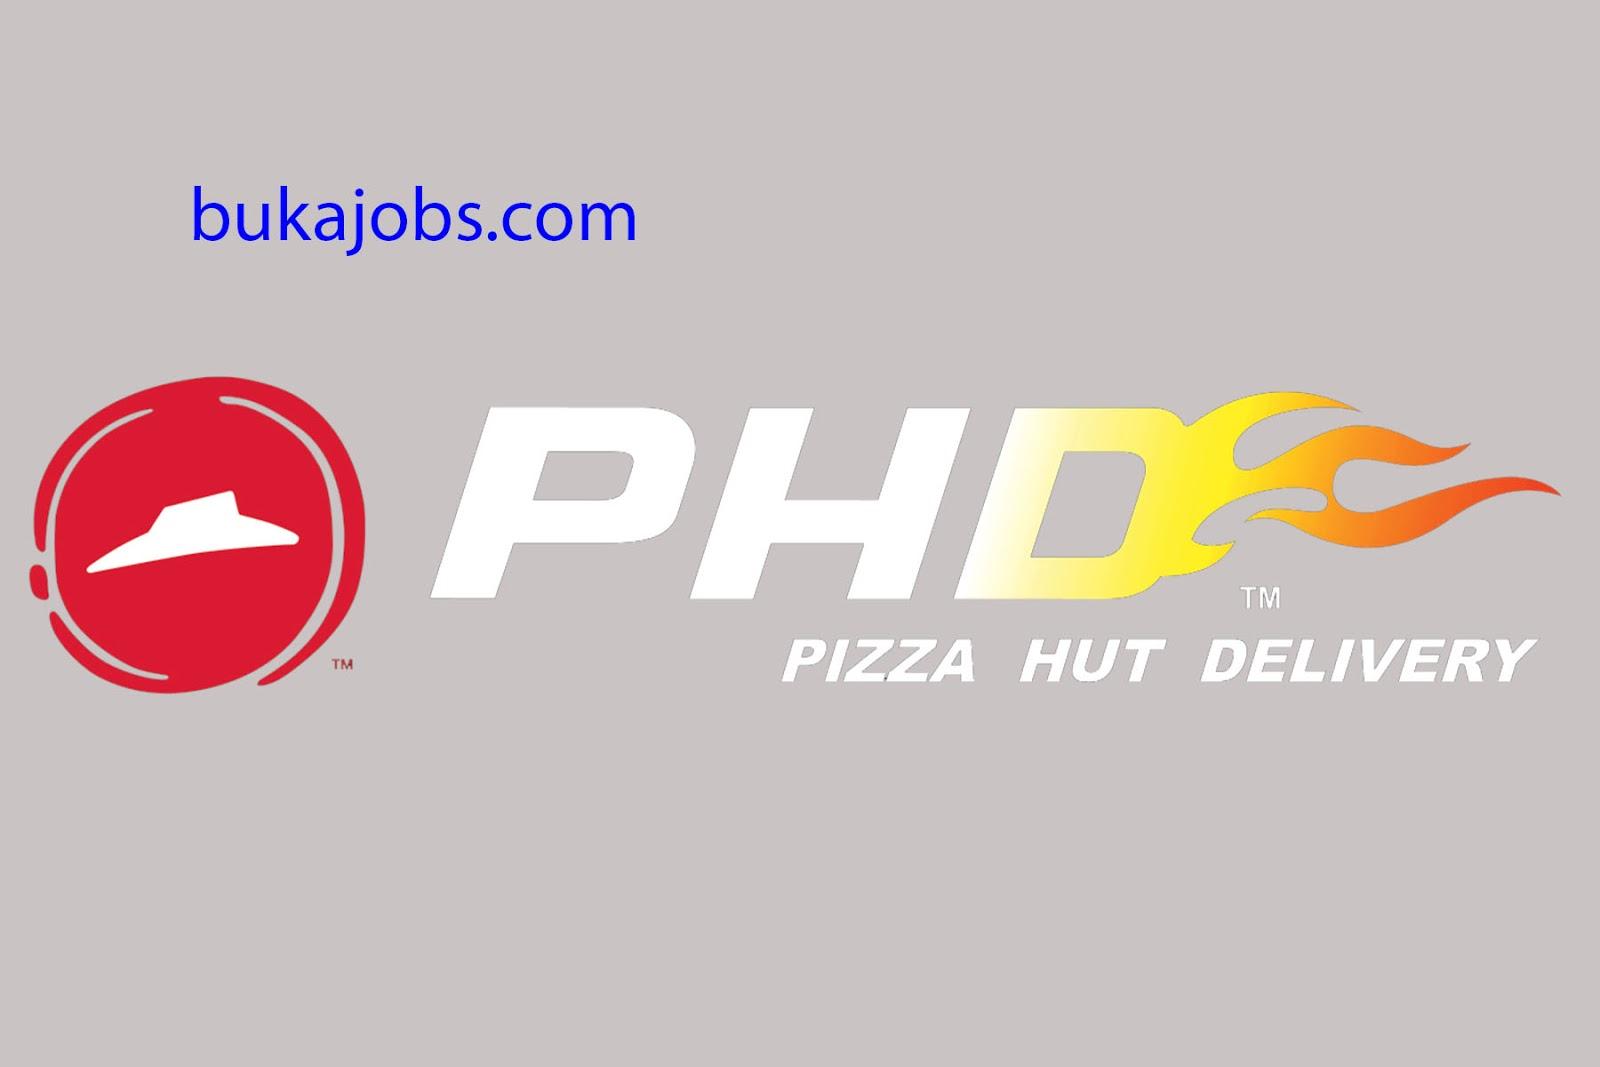 Lowongan Kerja Pizza Hut Delivery 2019